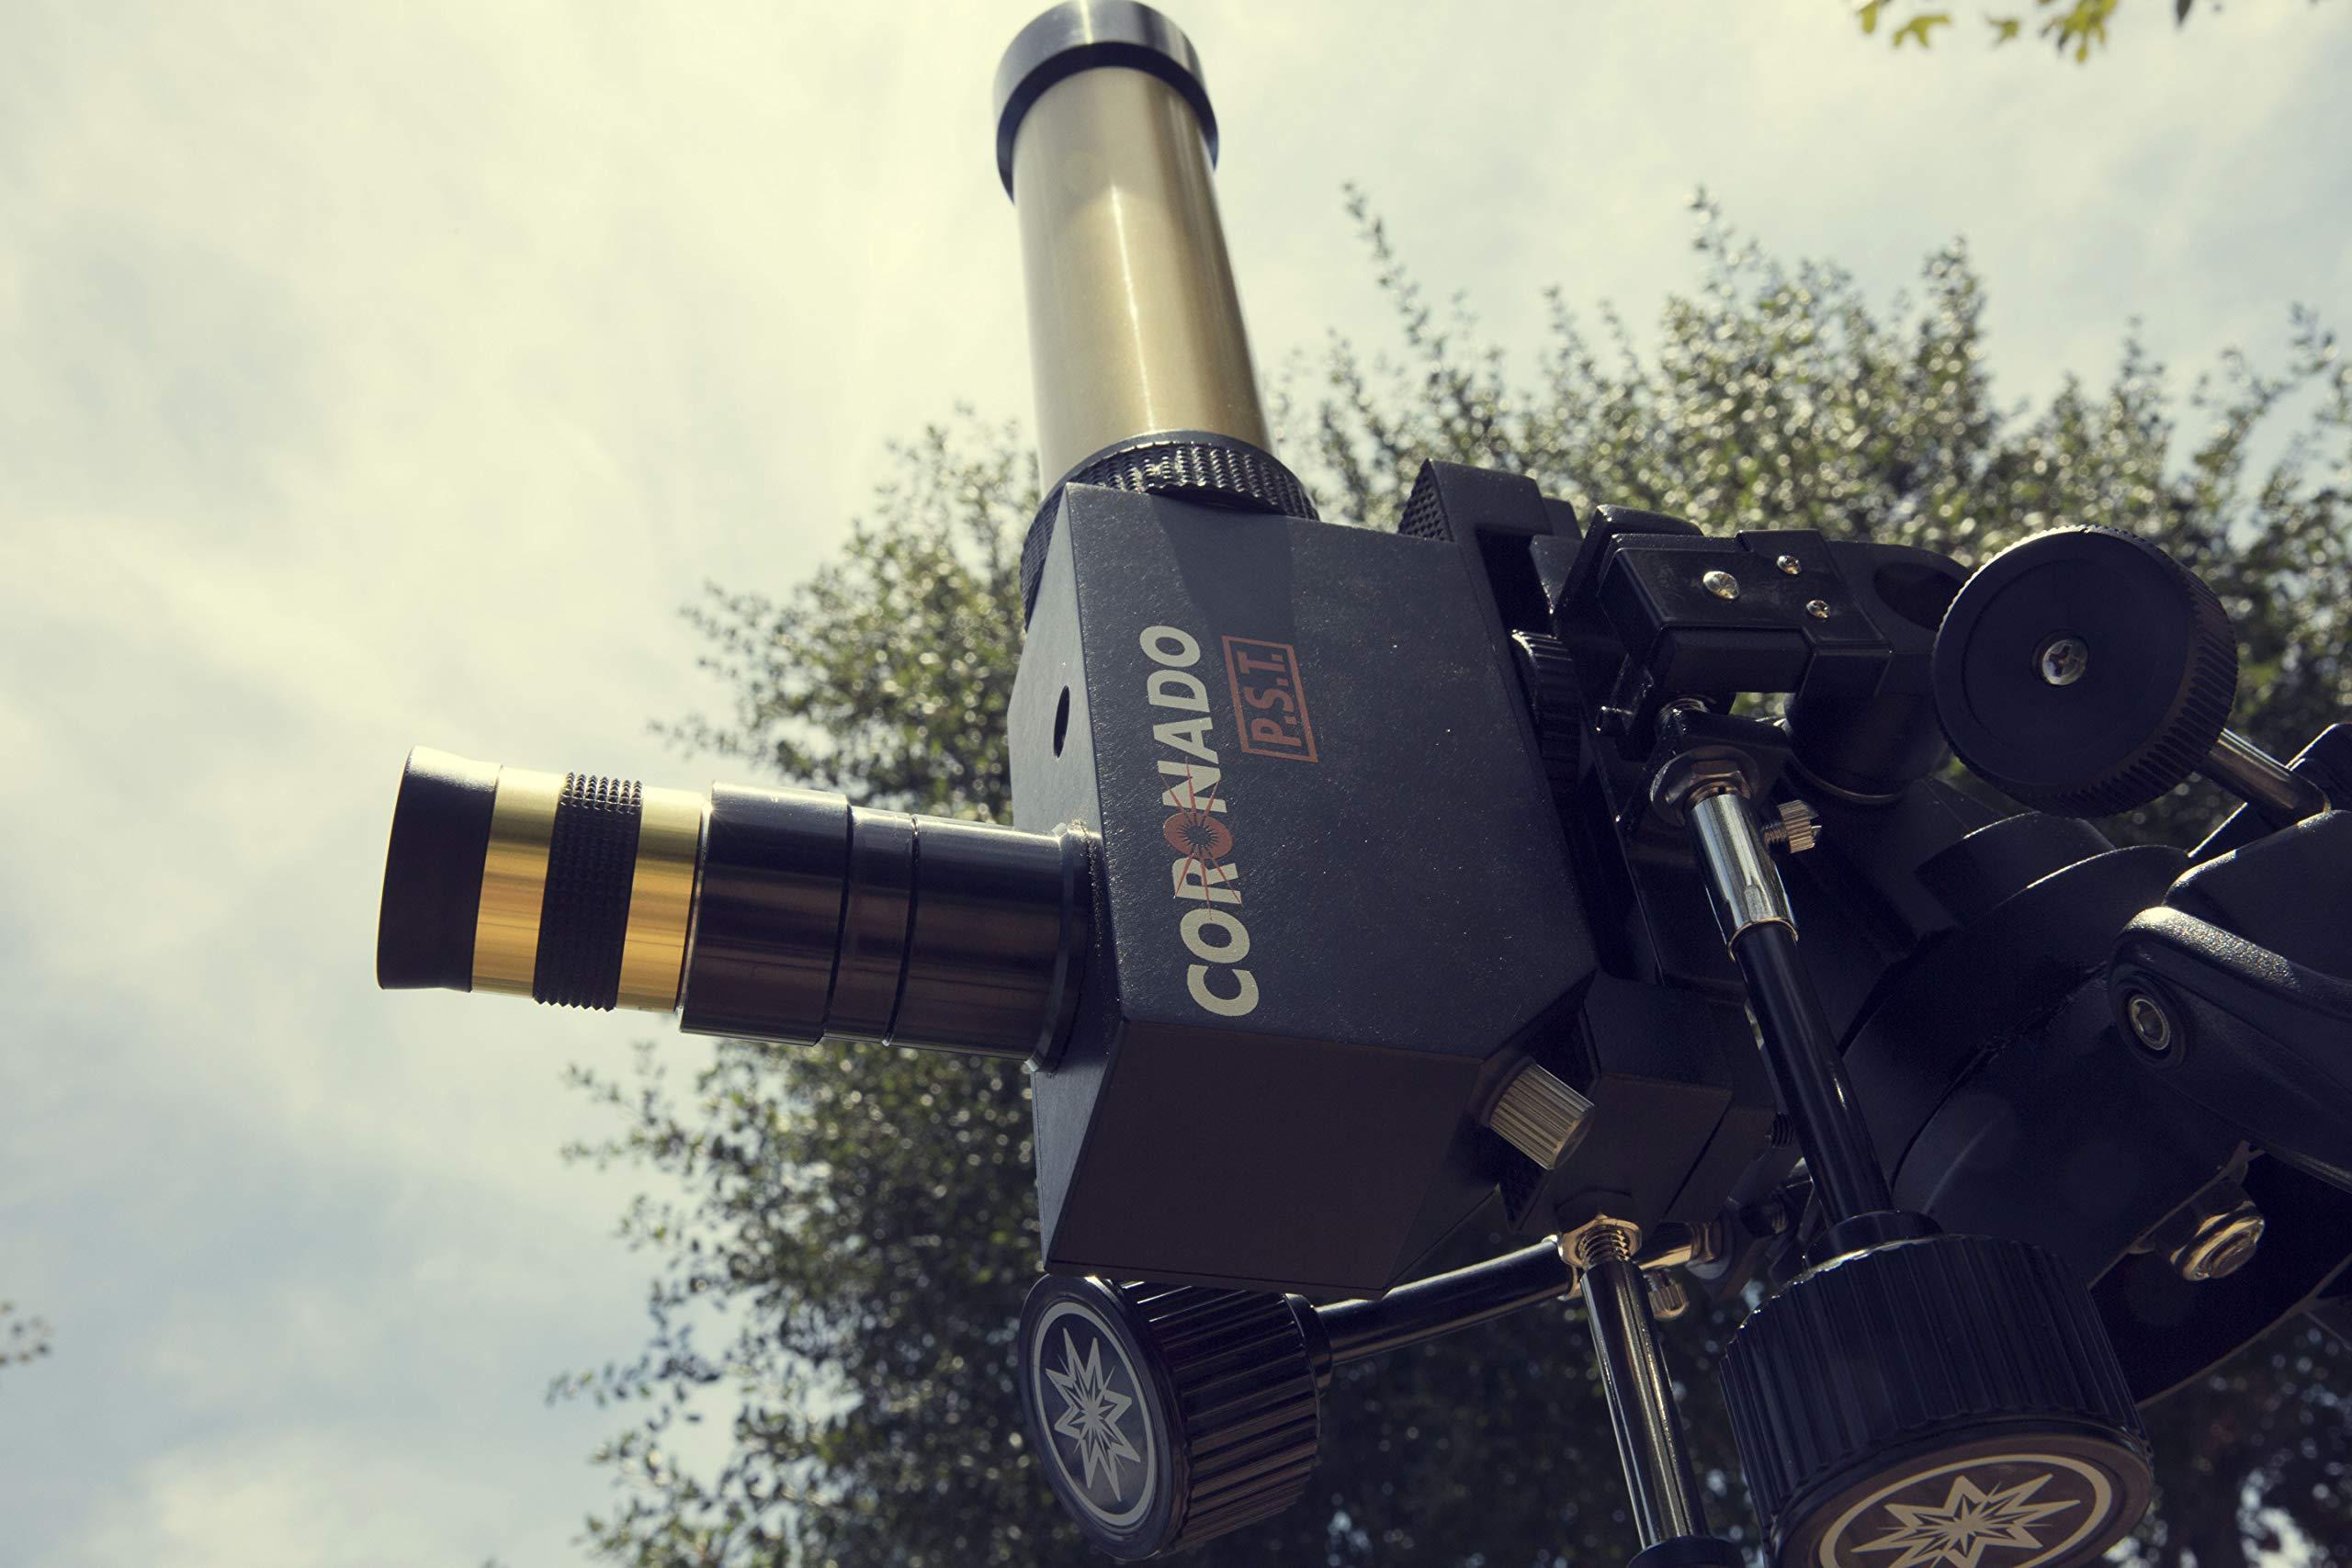 Meade Instruments 0.5PST Coronado H-Alpha Personal Solar Telescope (Black) by Meade Instruments